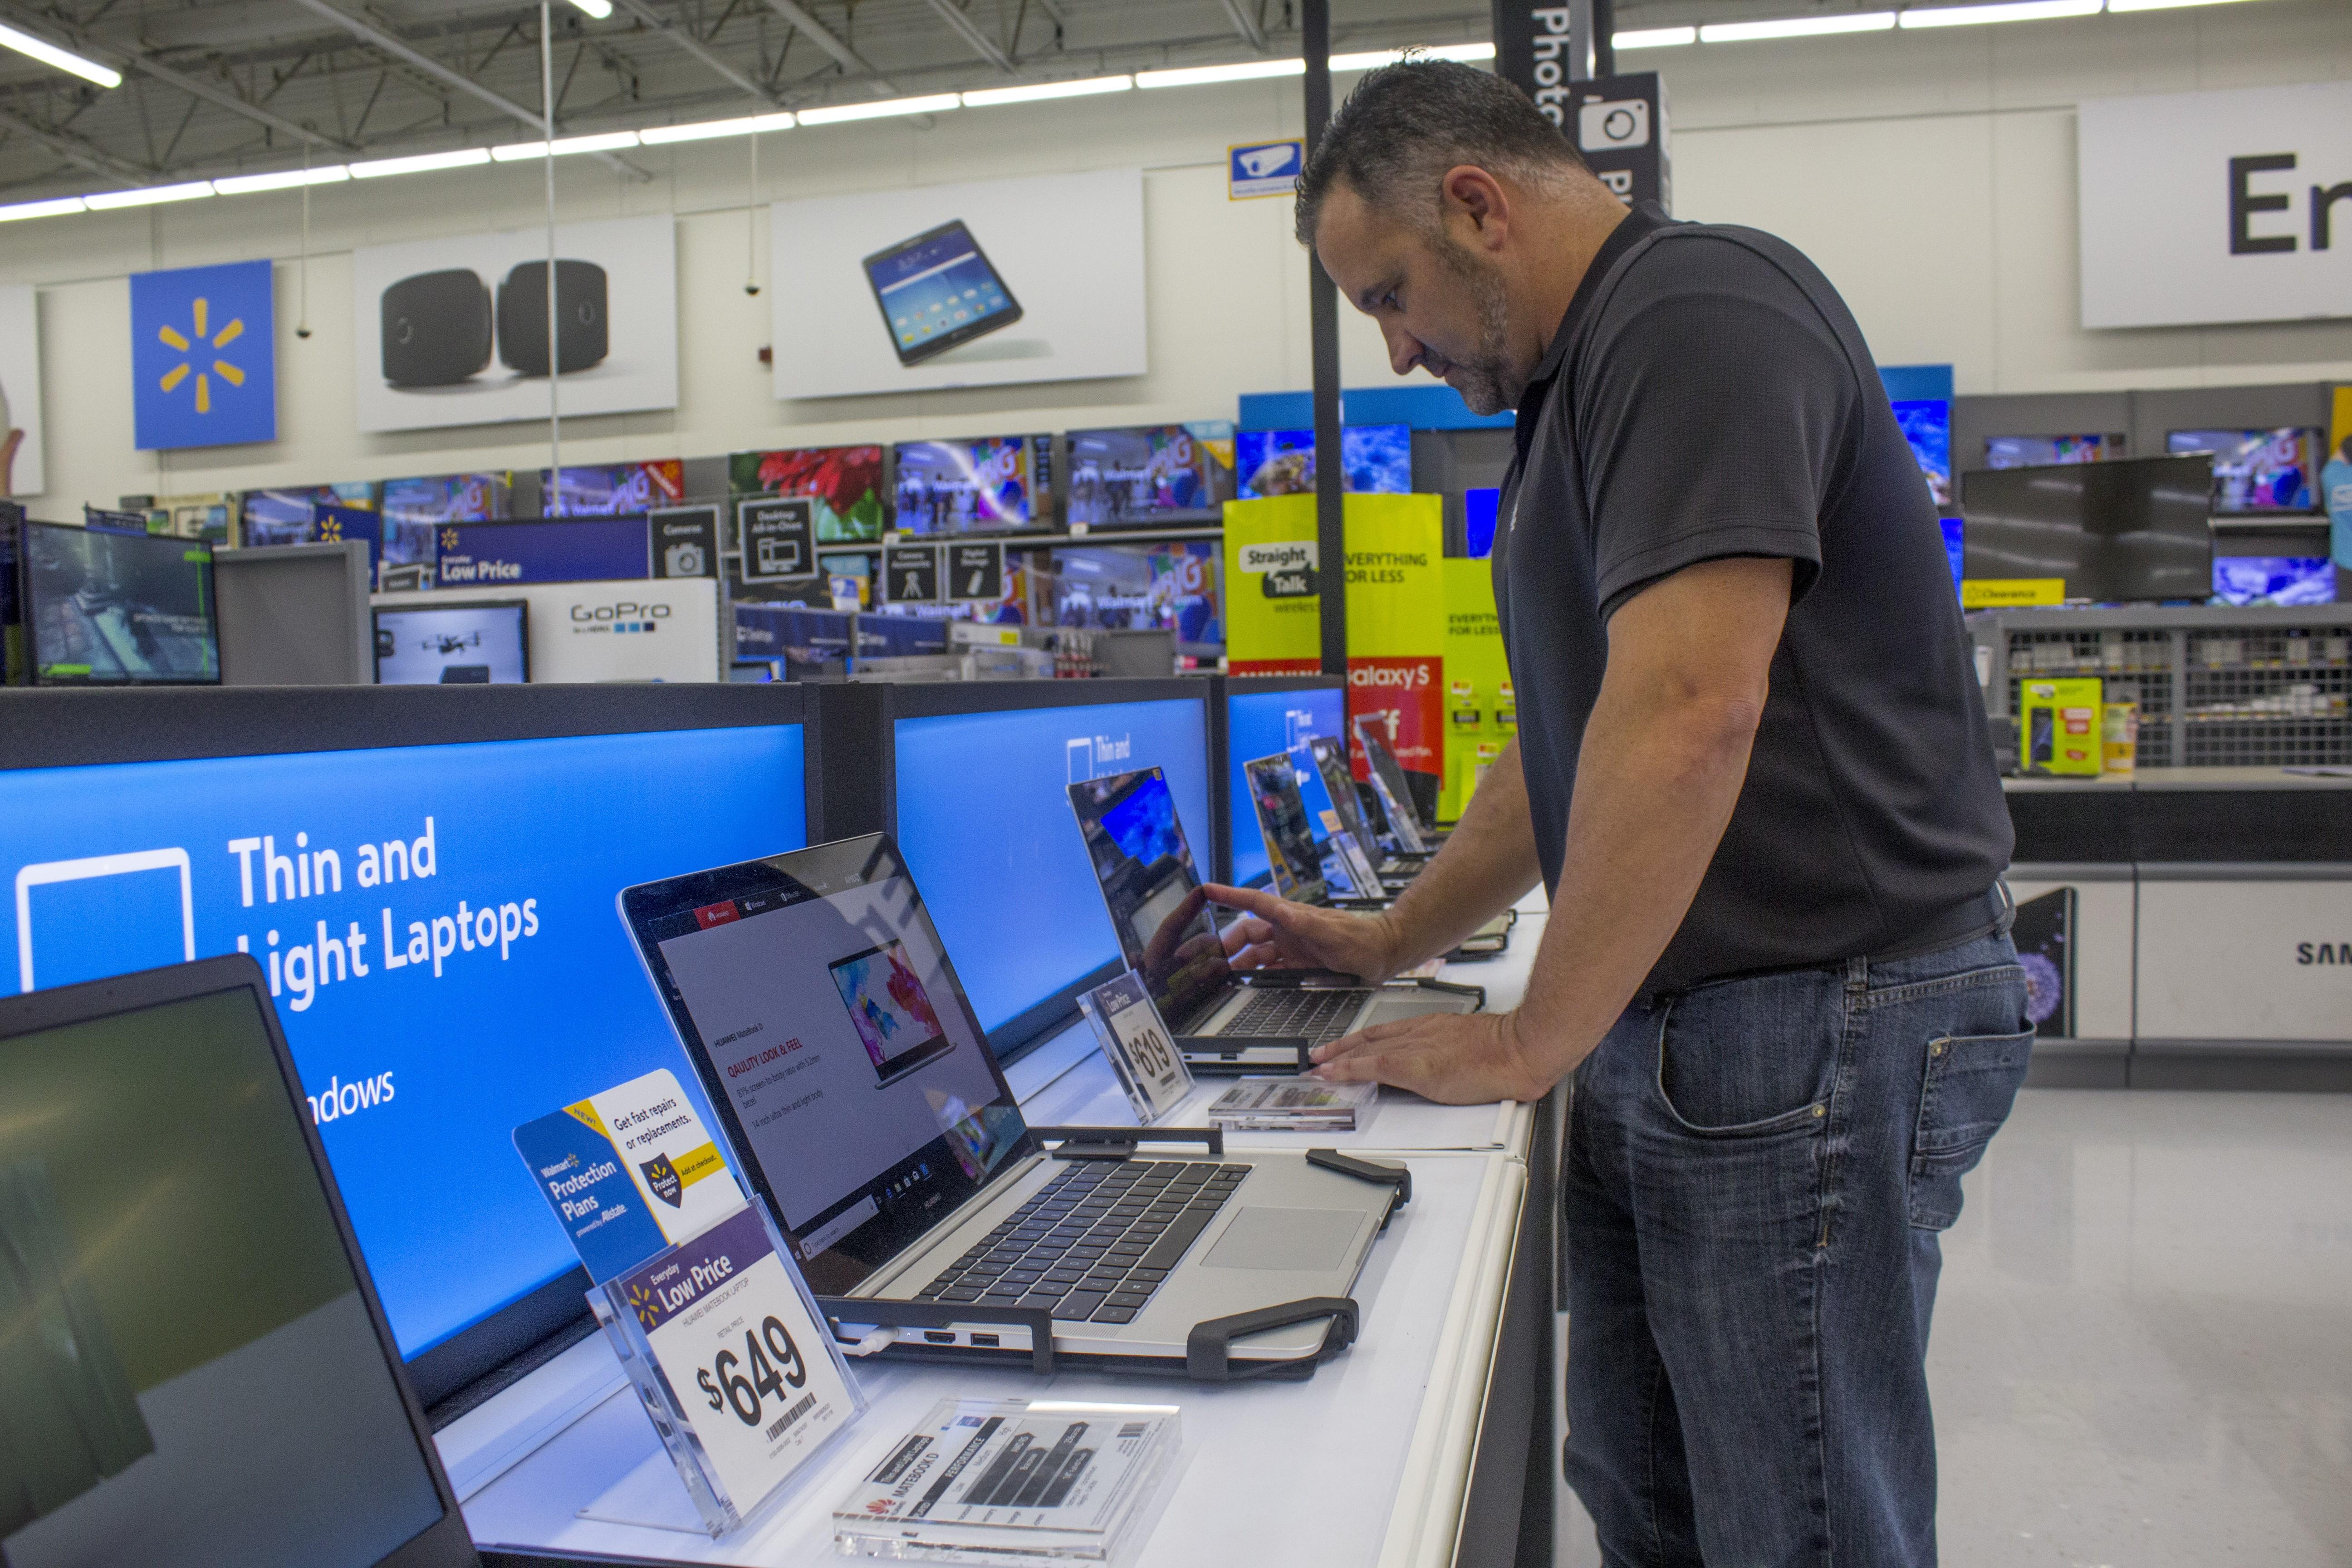 A customer shops for a laptop in a Walmart Supercenter